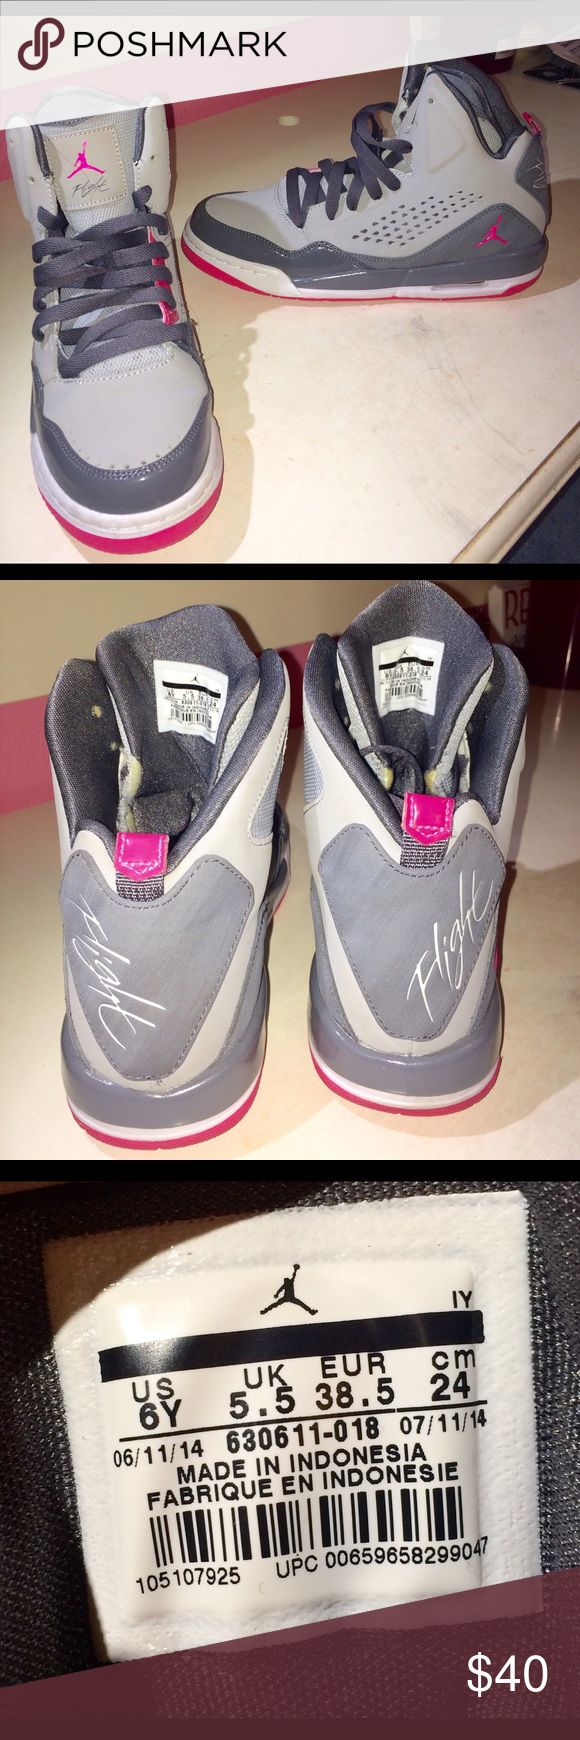 Flight Jordan shoes Pink, grey, white and pink high top Jordan flight shoes. Worn once! Very cute shoes! Size 8 Jordan Shoes Sneakers